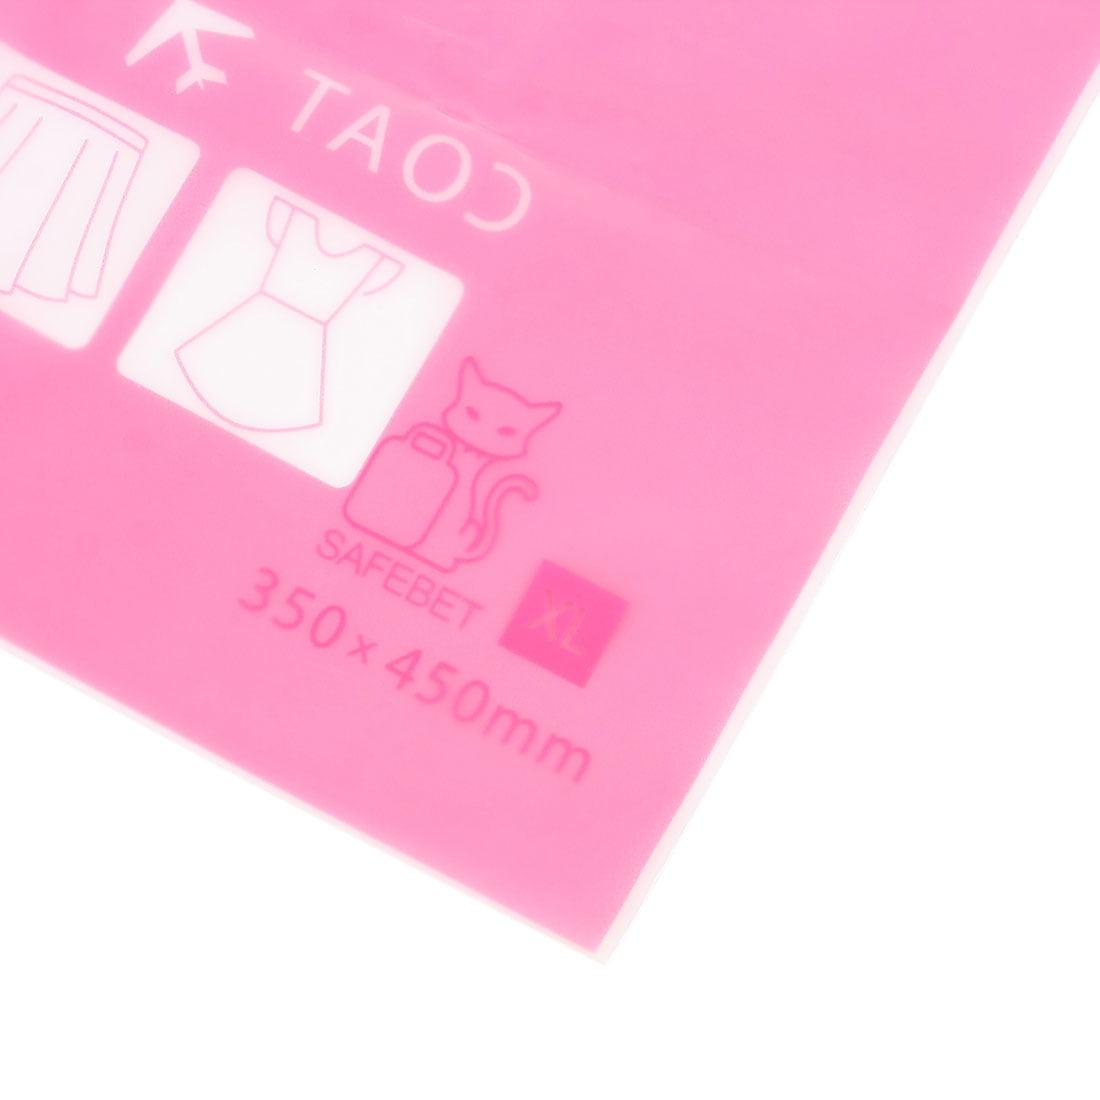 Plastic Water Resistant Travel Clothes Underwear Storage Bag 28x40cm Fuchsia - image 2 de 8